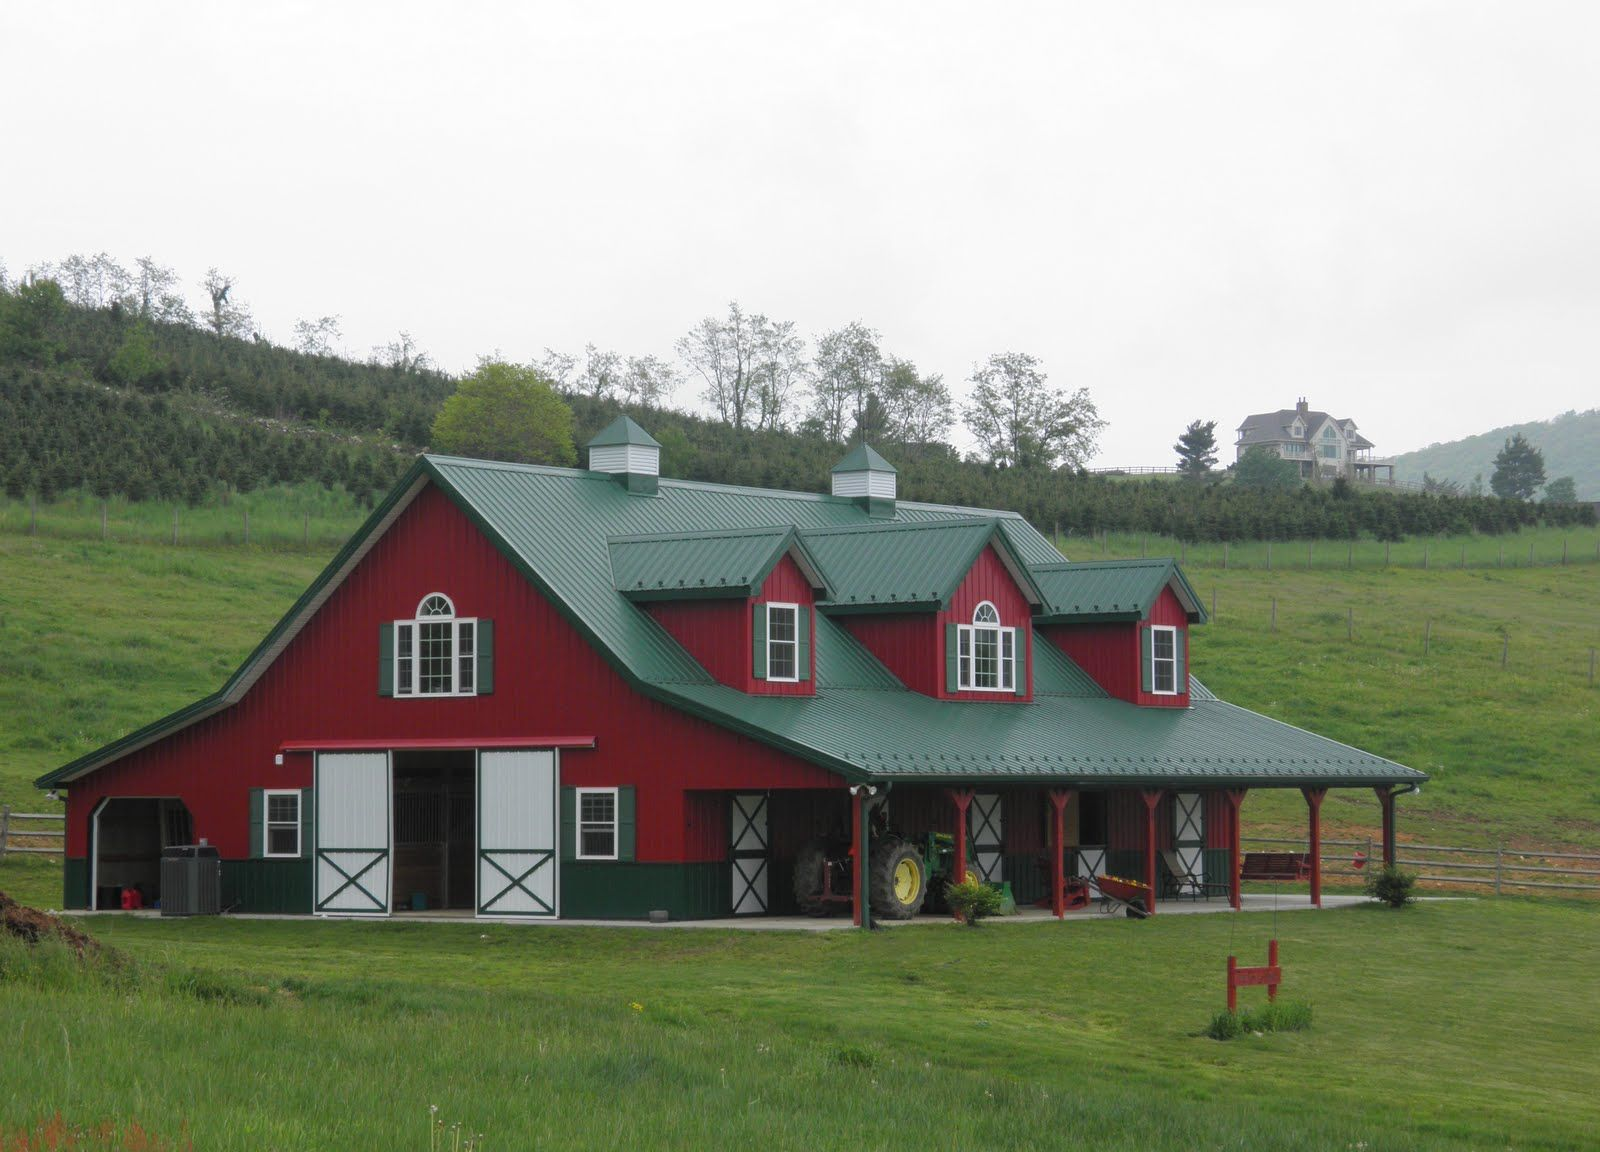 metal barn house plans. metal barn house plans  Bee Home Plan Best Barndominium Floor Plans For Planning Your House